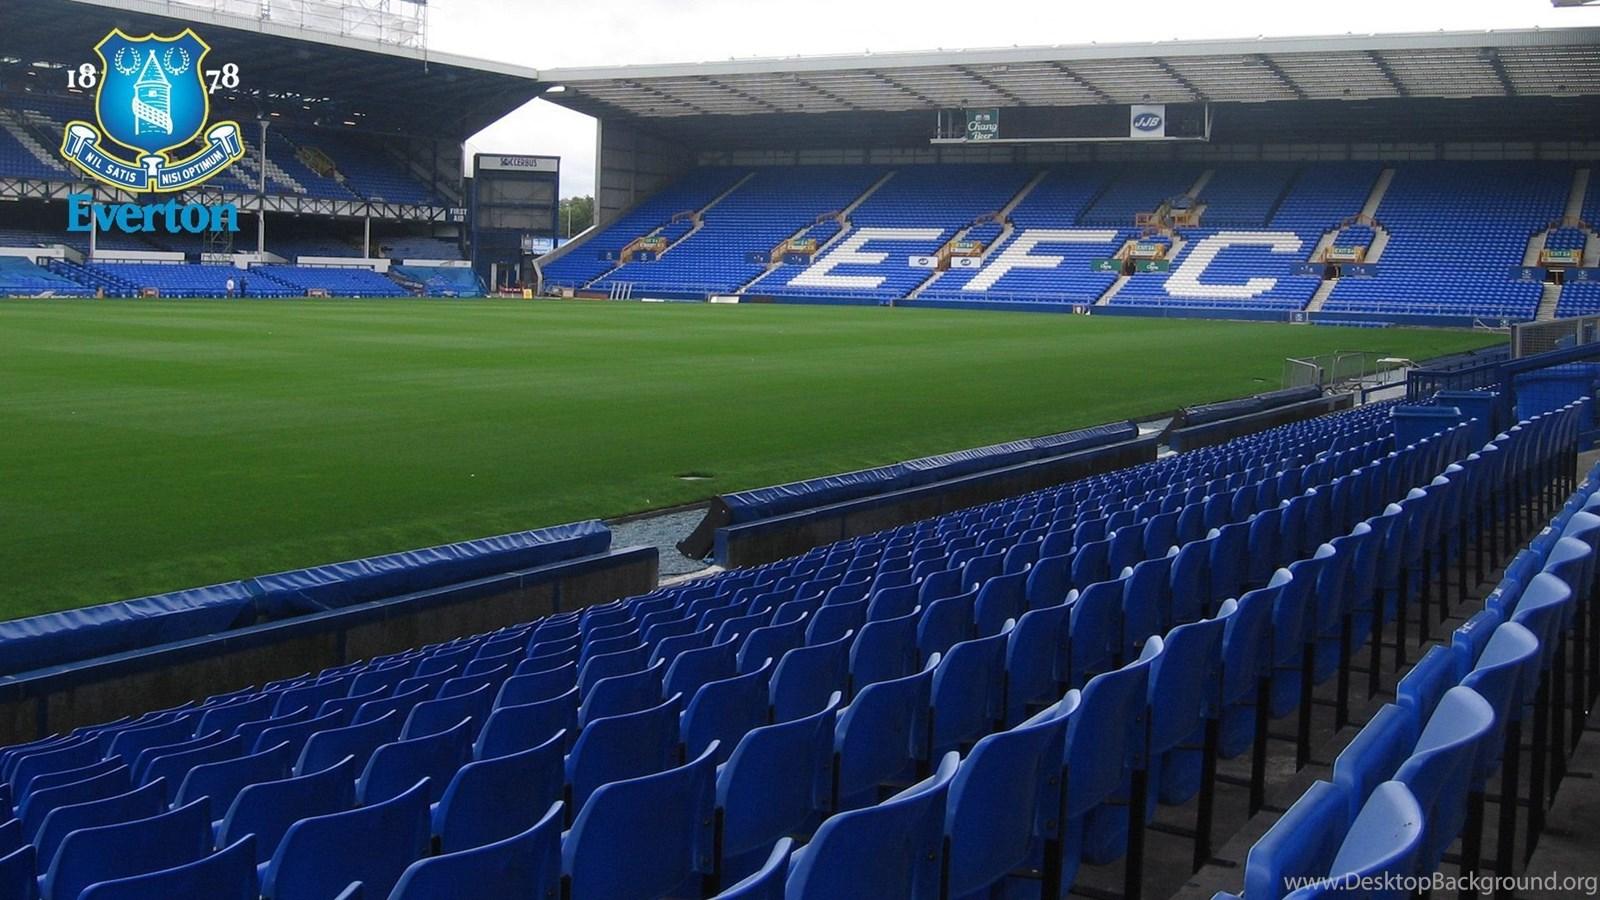 Everton Fc Hd Wallpapers And Photos Download Desktop